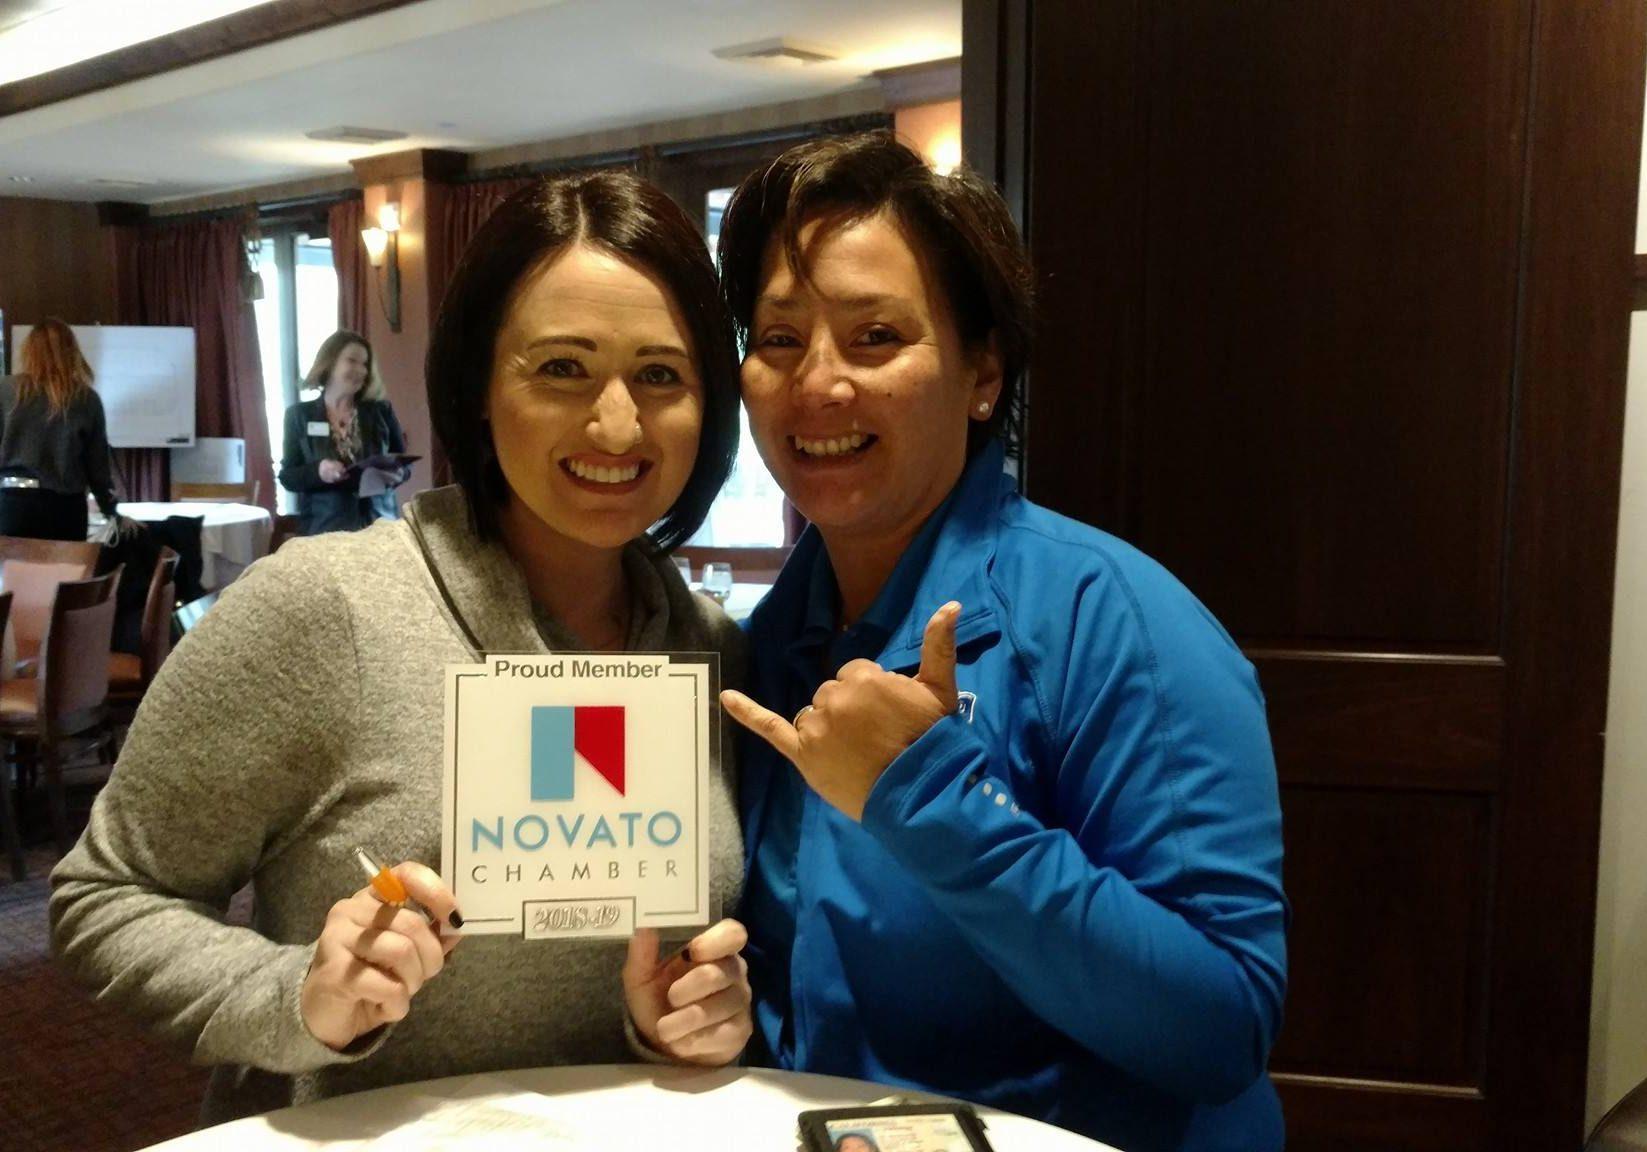 Membership Novato kona Ice Chamber North Marin Christina Niles